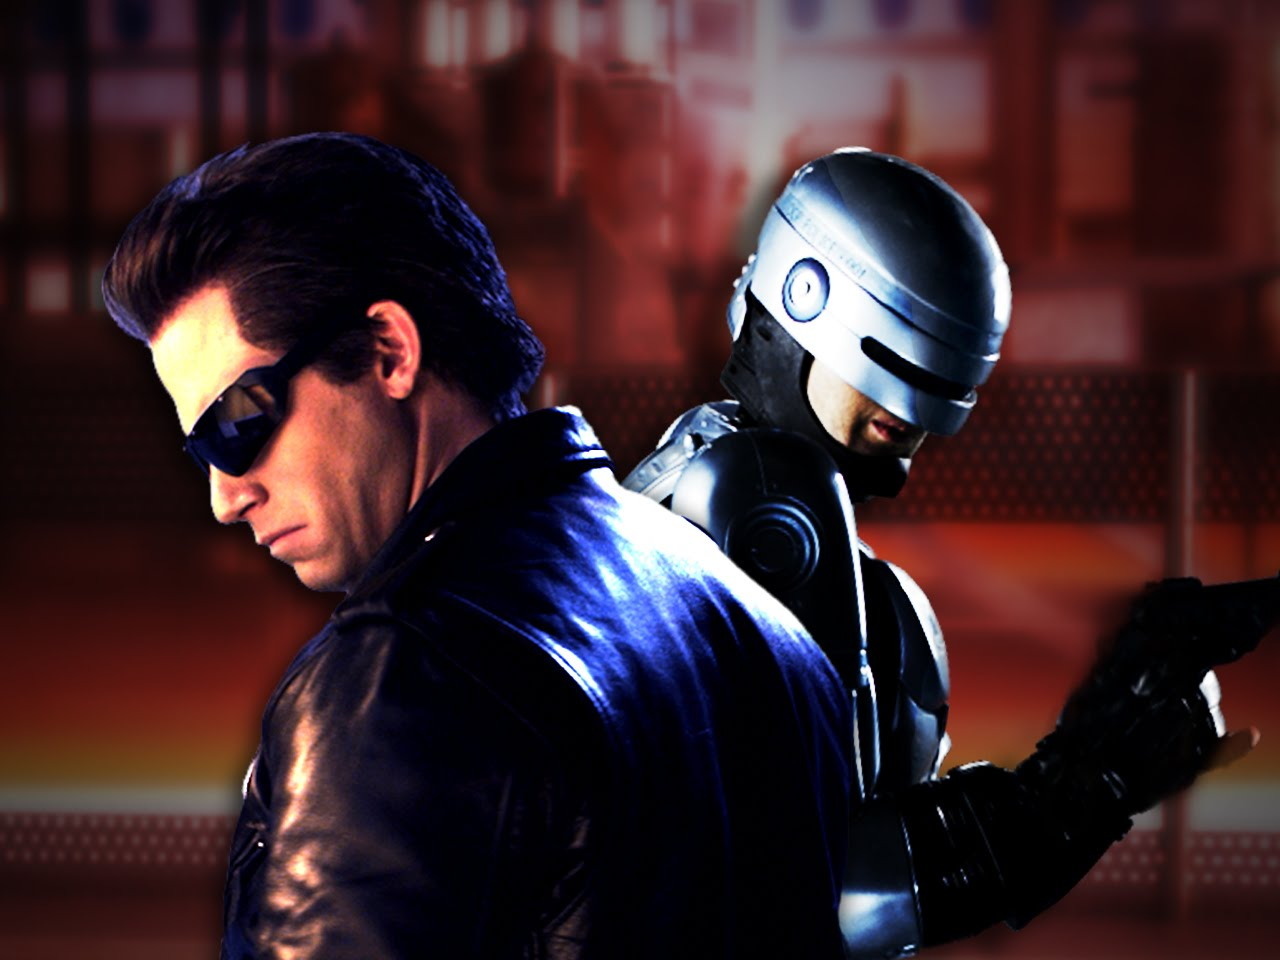 Amazing Terminator Robocop Pictures & Backgrounds